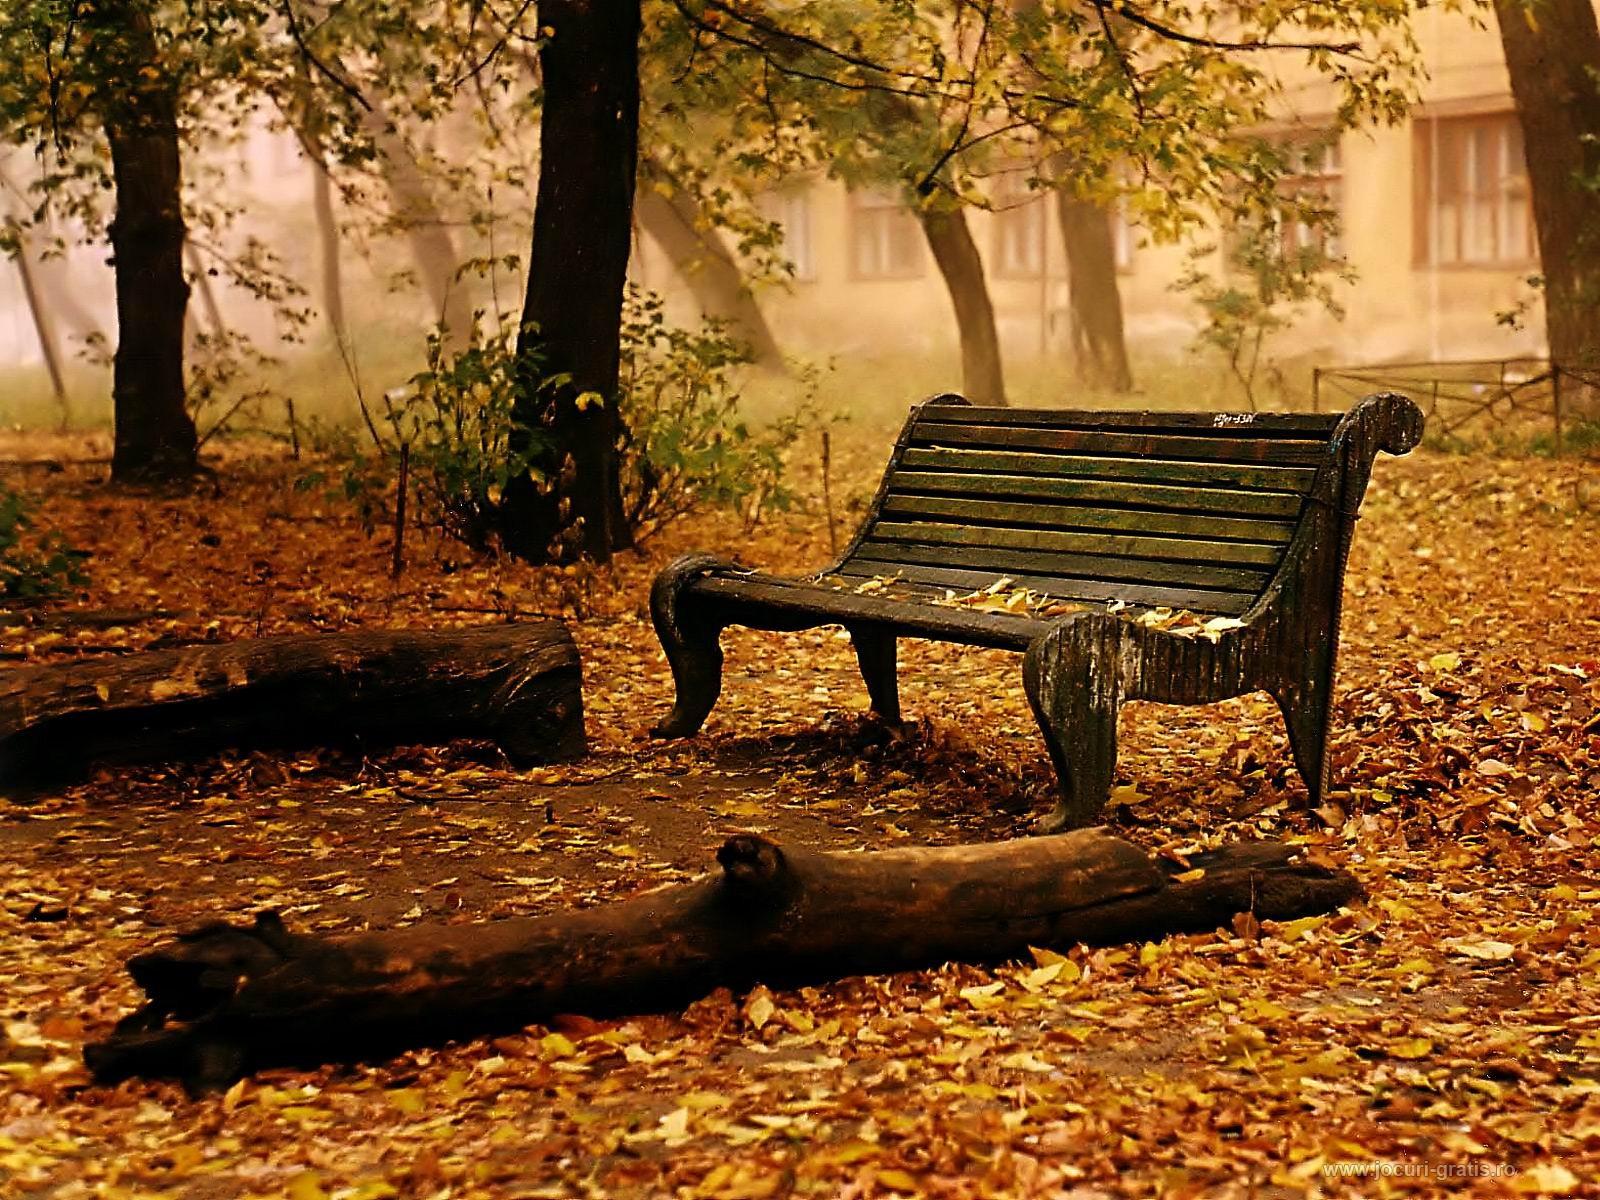 nature wallpaper autumn fall 1600x1200jpg 1600x1200